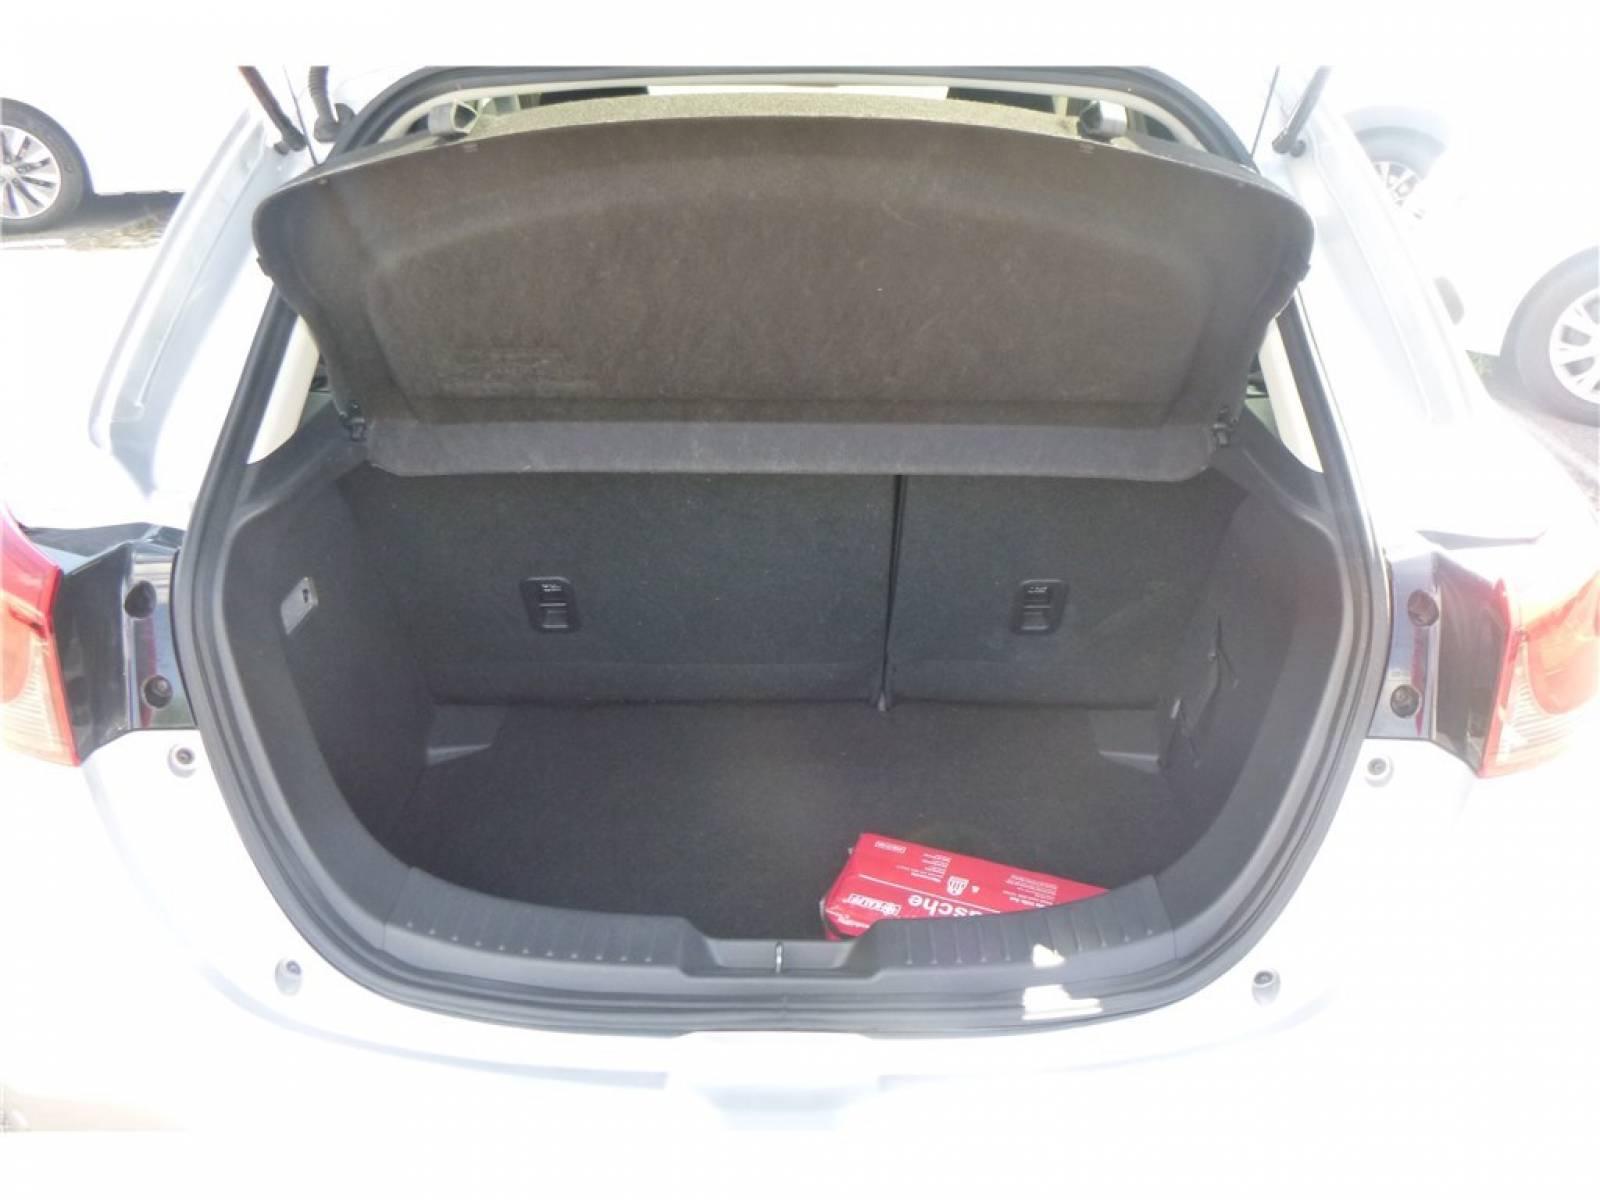 MAZDA Mazda2 1.5L SKYACTIV-G 90ch - véhicule d'occasion - Groupe Guillet - Chalon Automobiles - 71100 - Chalon-sur-Saône - 5